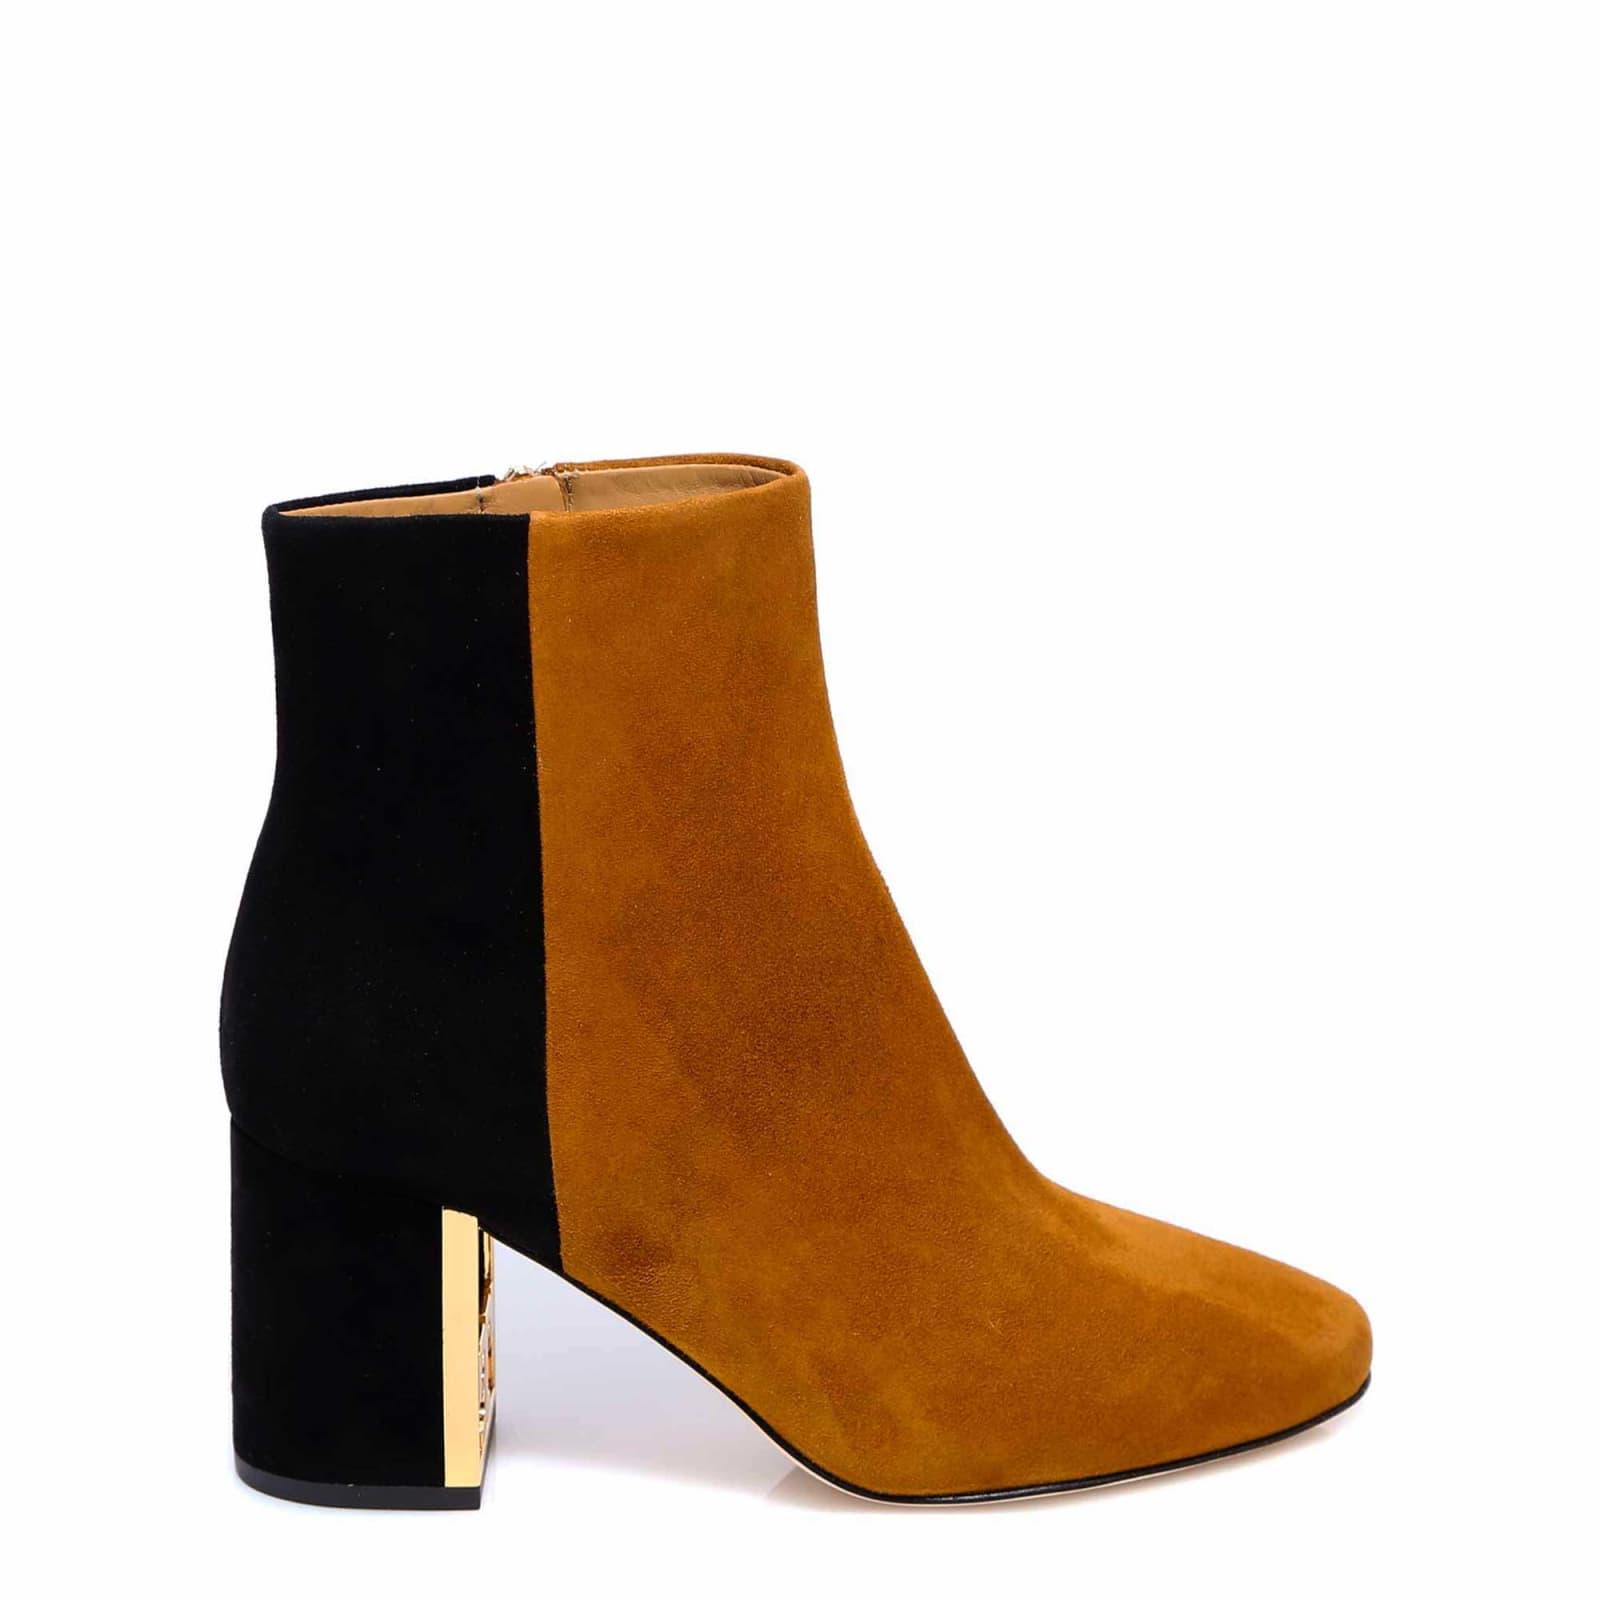 Tory Burch Boots | italist, ALWAYS LIKE